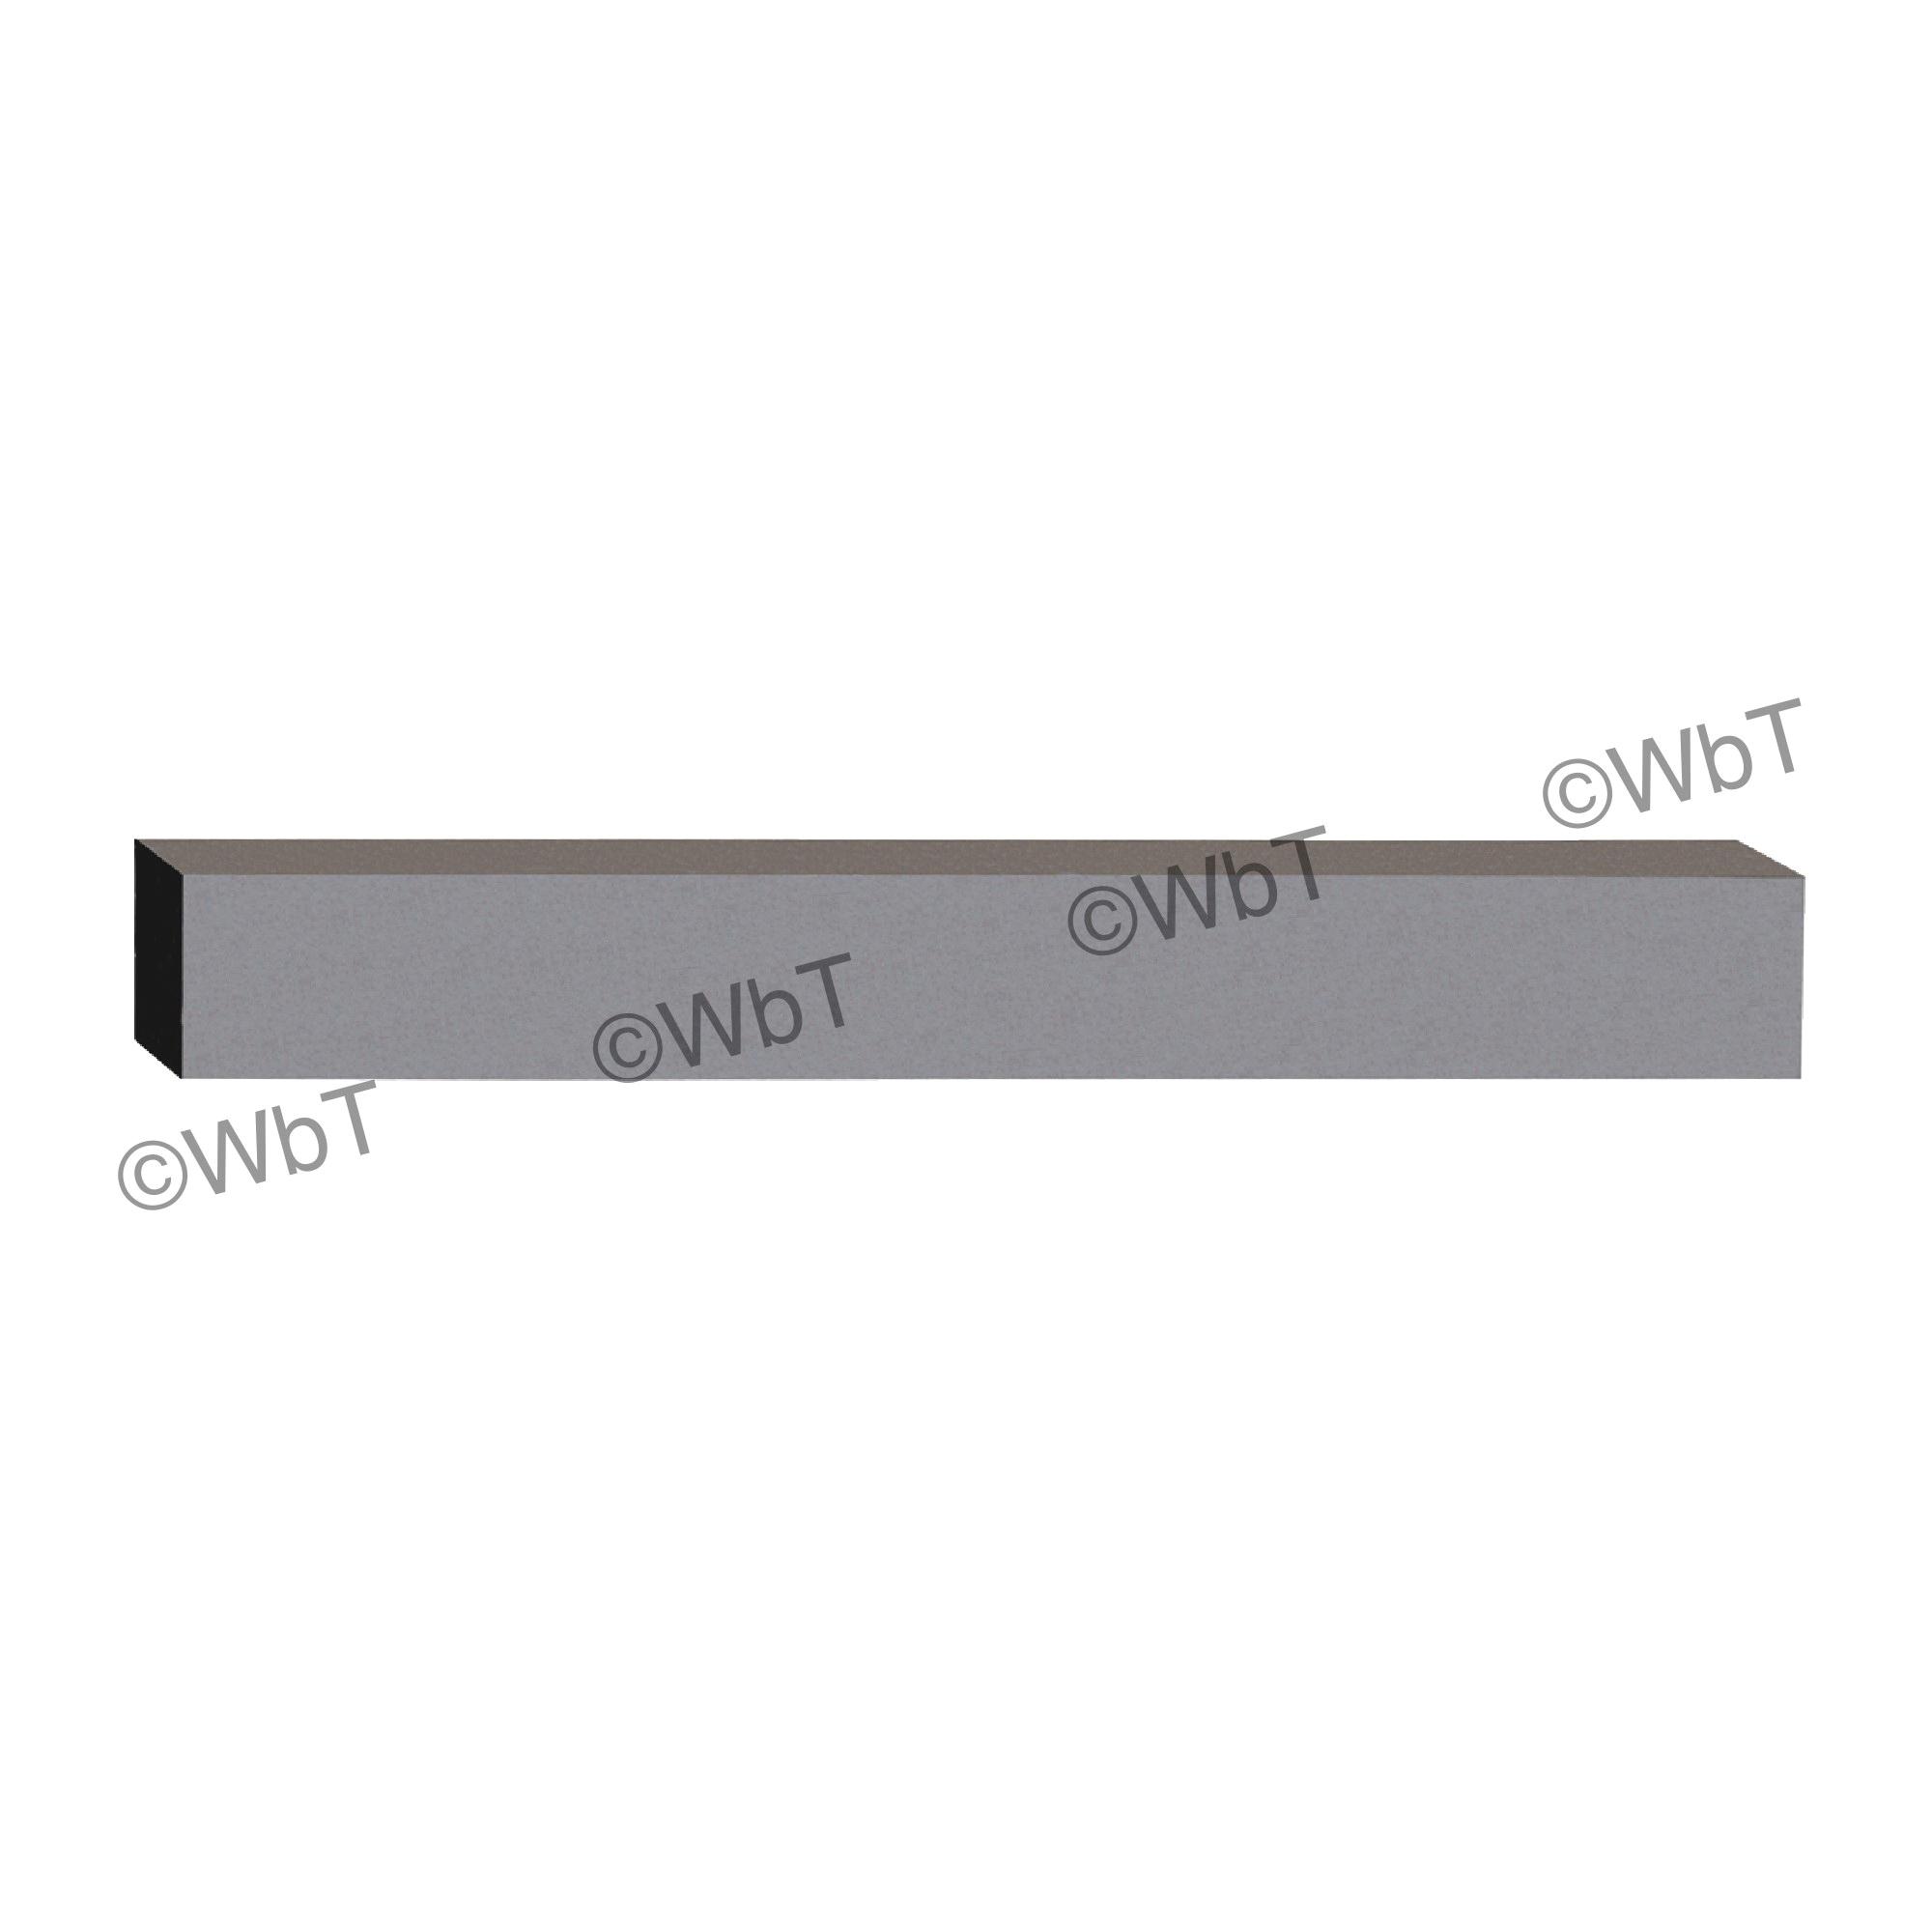 TTC 01-100-032 A20 General Purpose Jobbers Length Straight Shank Drill Blank, 6 in L, HSS